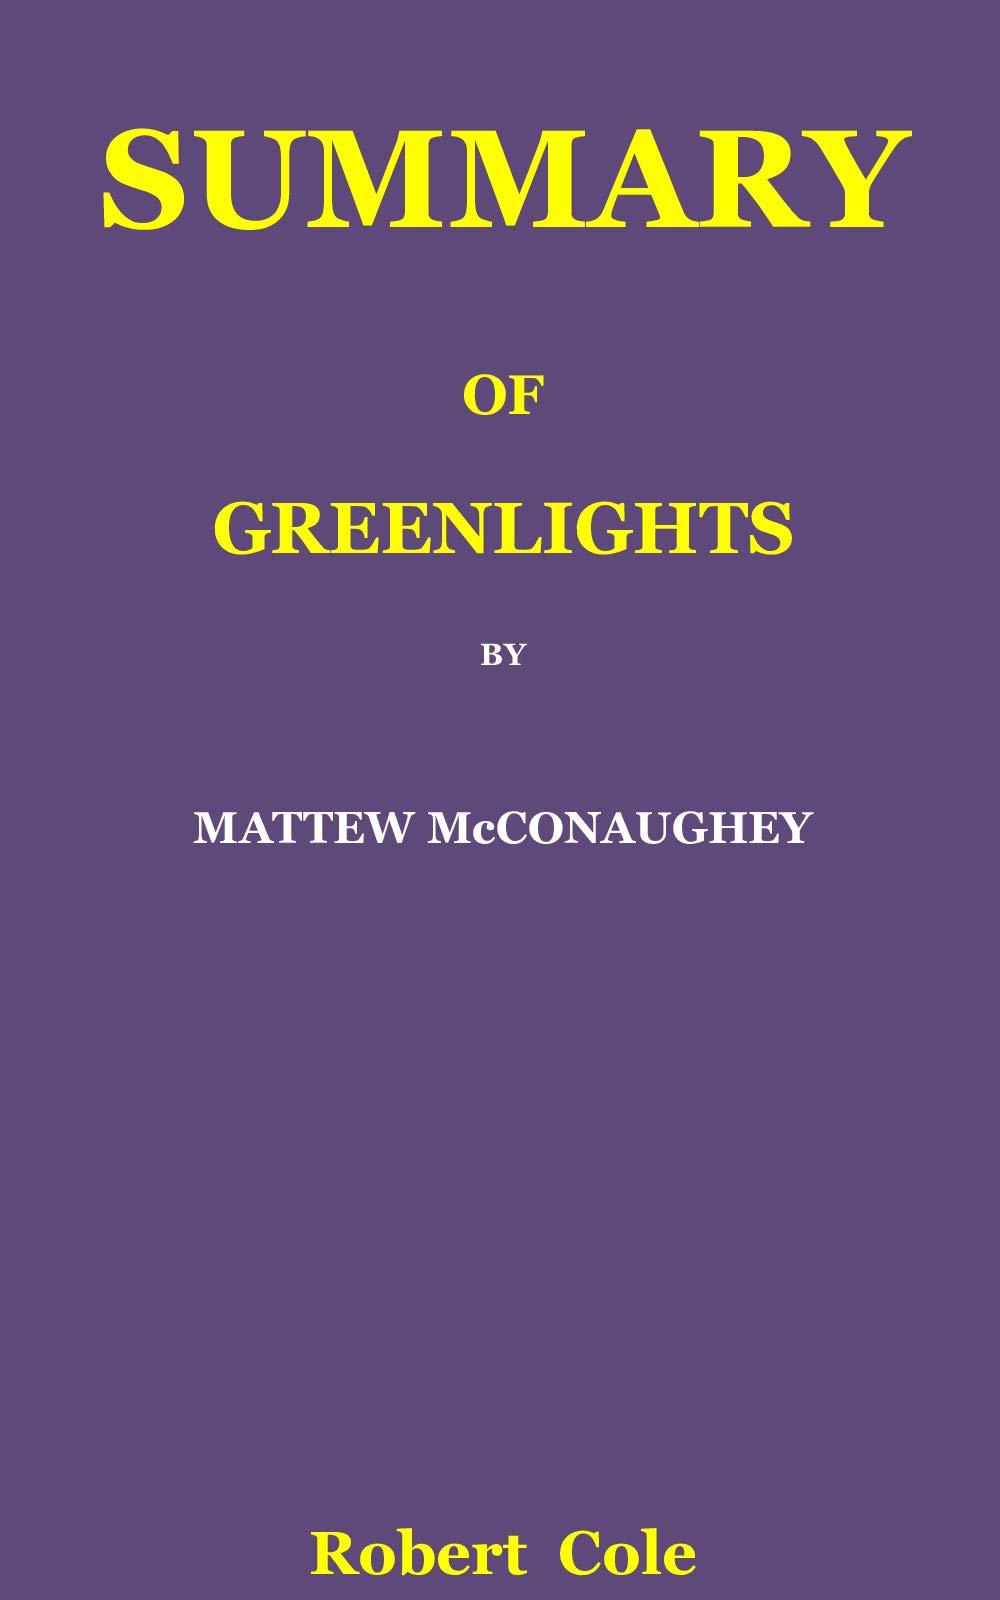 SUMMARY OF GREENLIGHTS BY MATTEW McCONAUGHEY